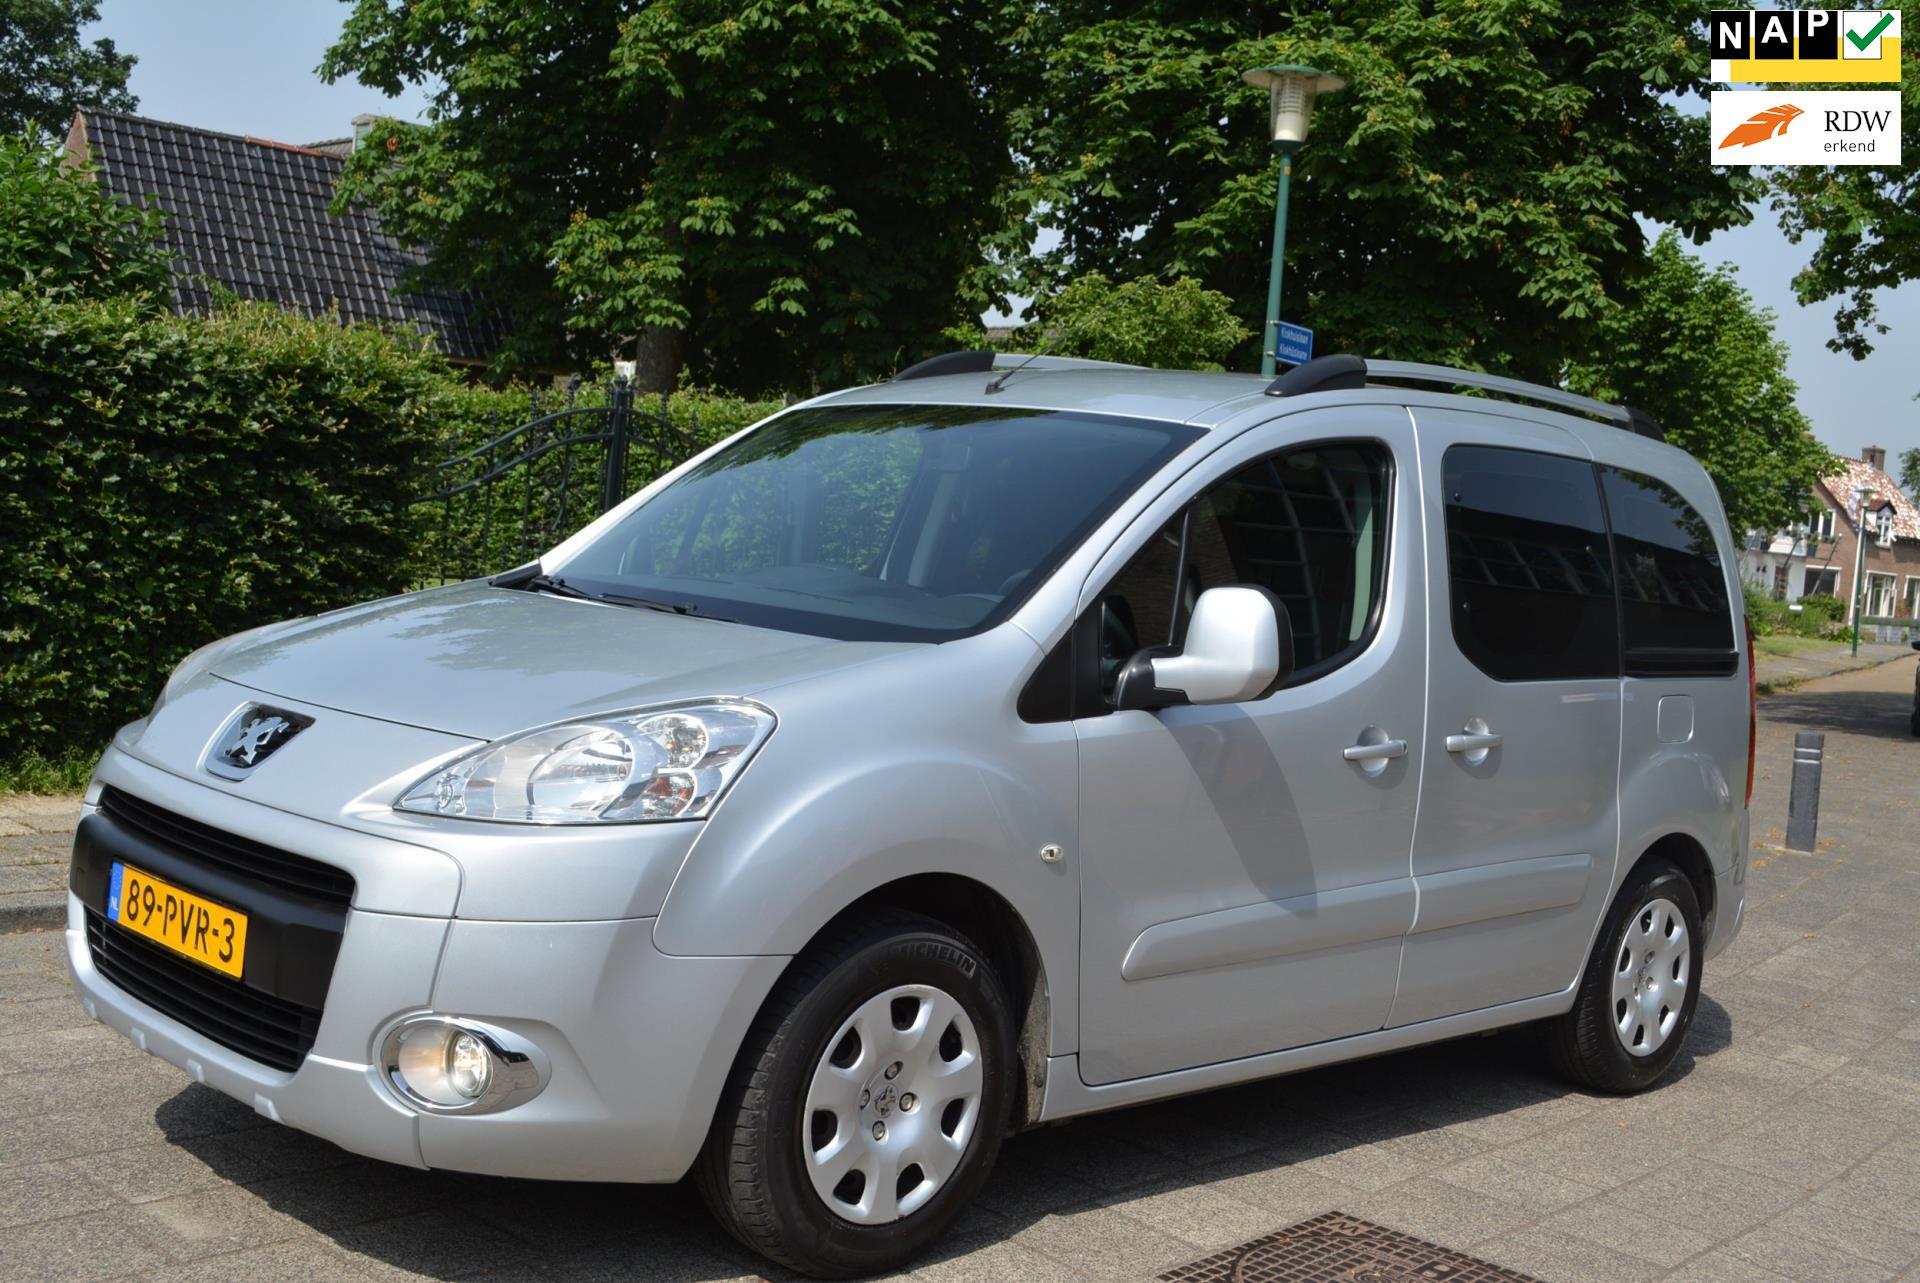 Peugeot Partner Tepee occasion - Autobedrijf Kiewiet (Auto 25)